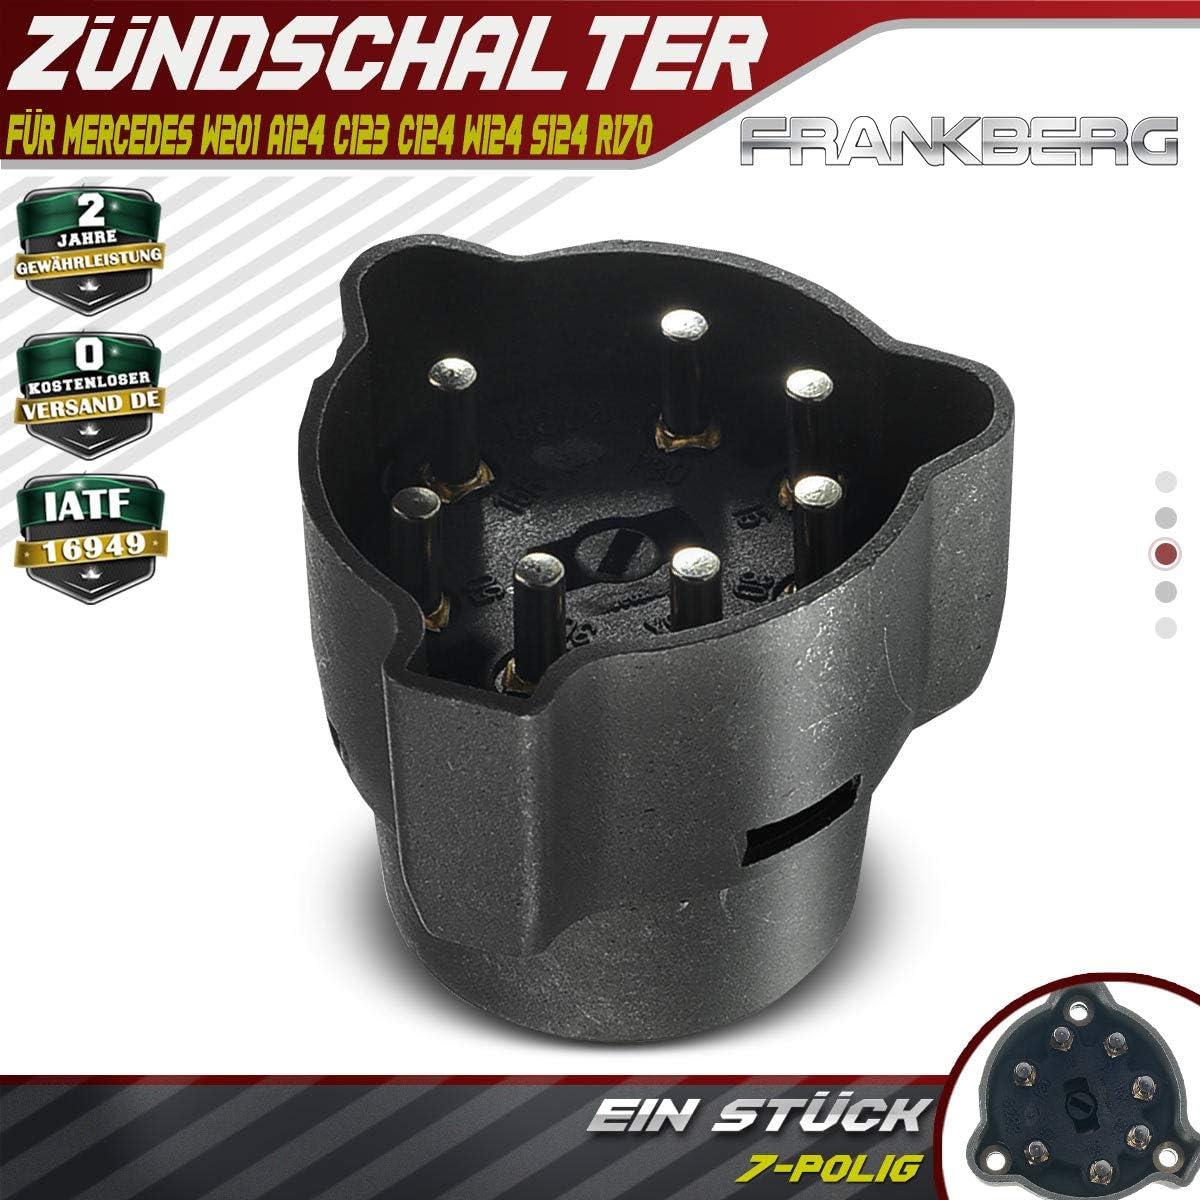 Z/ünd-//Startschalter Z/ündschalter f/ür W201 A124 C123 C124 W124 S124 R170 1976-2001 1244620093